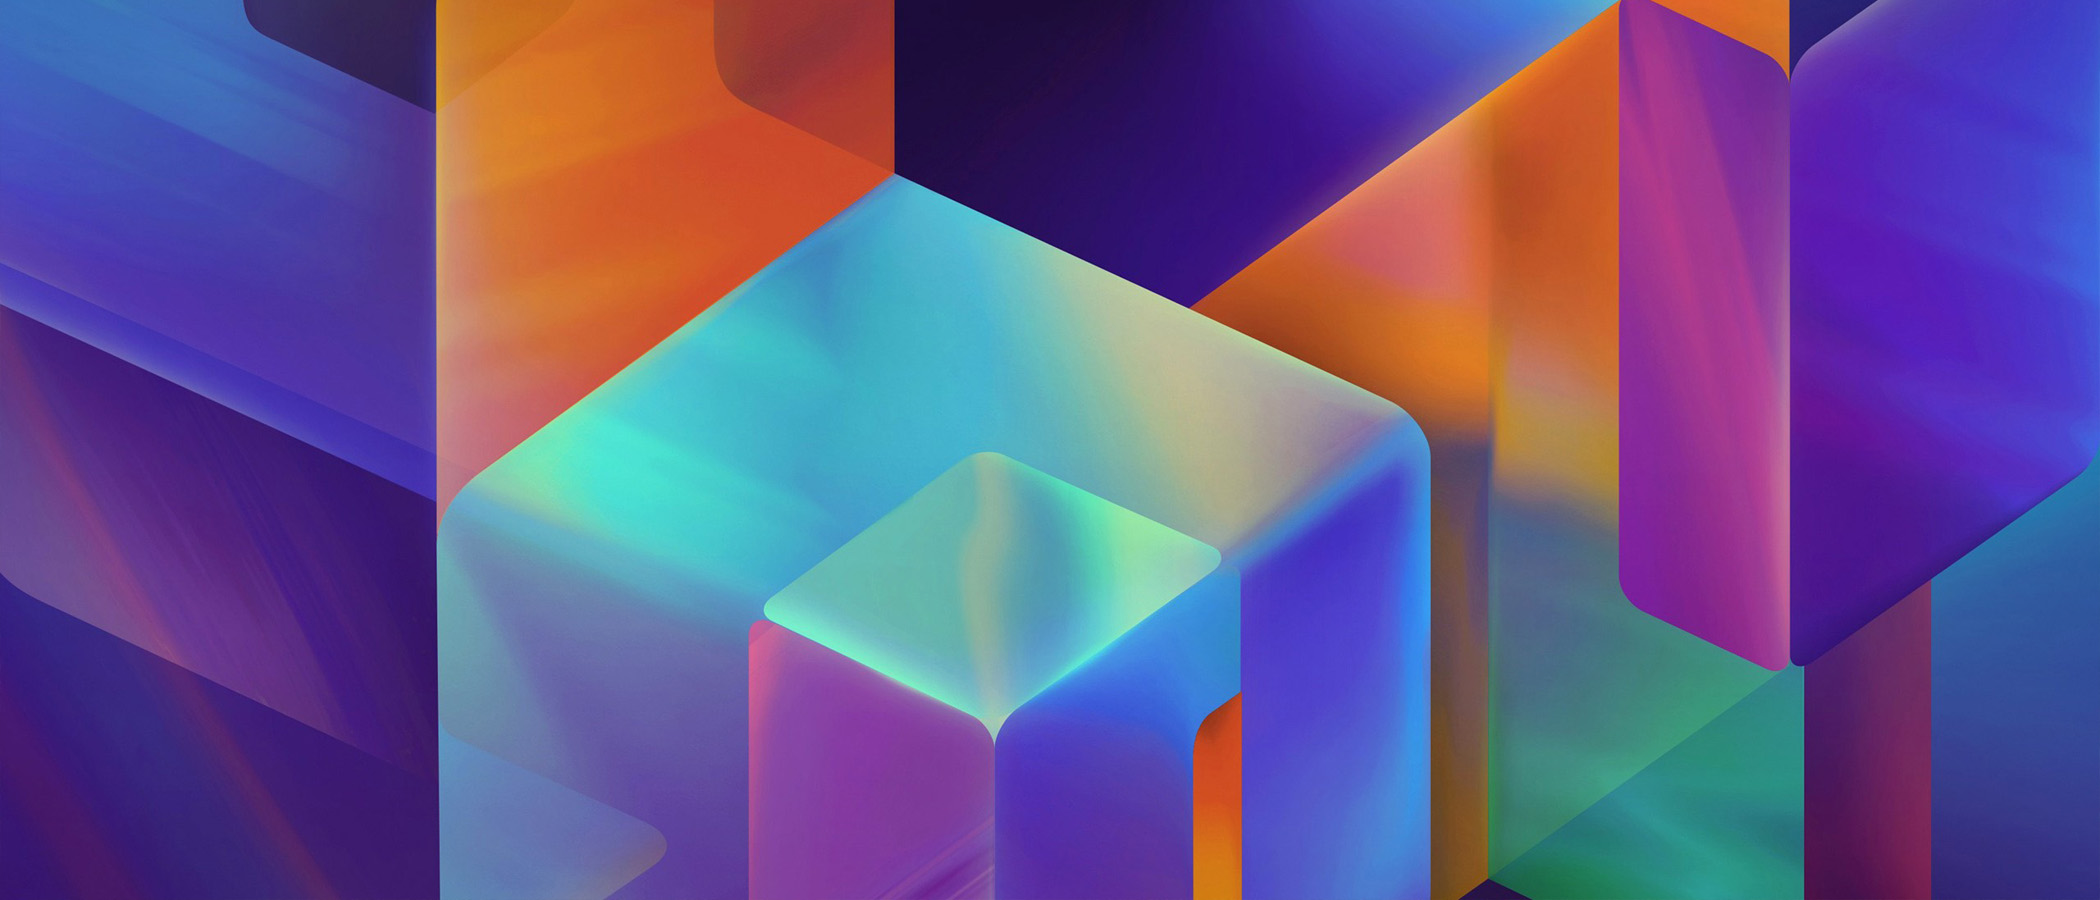 Szybkie modele 3D na podstawie rysunku 2D | Dibac dla SketchUp